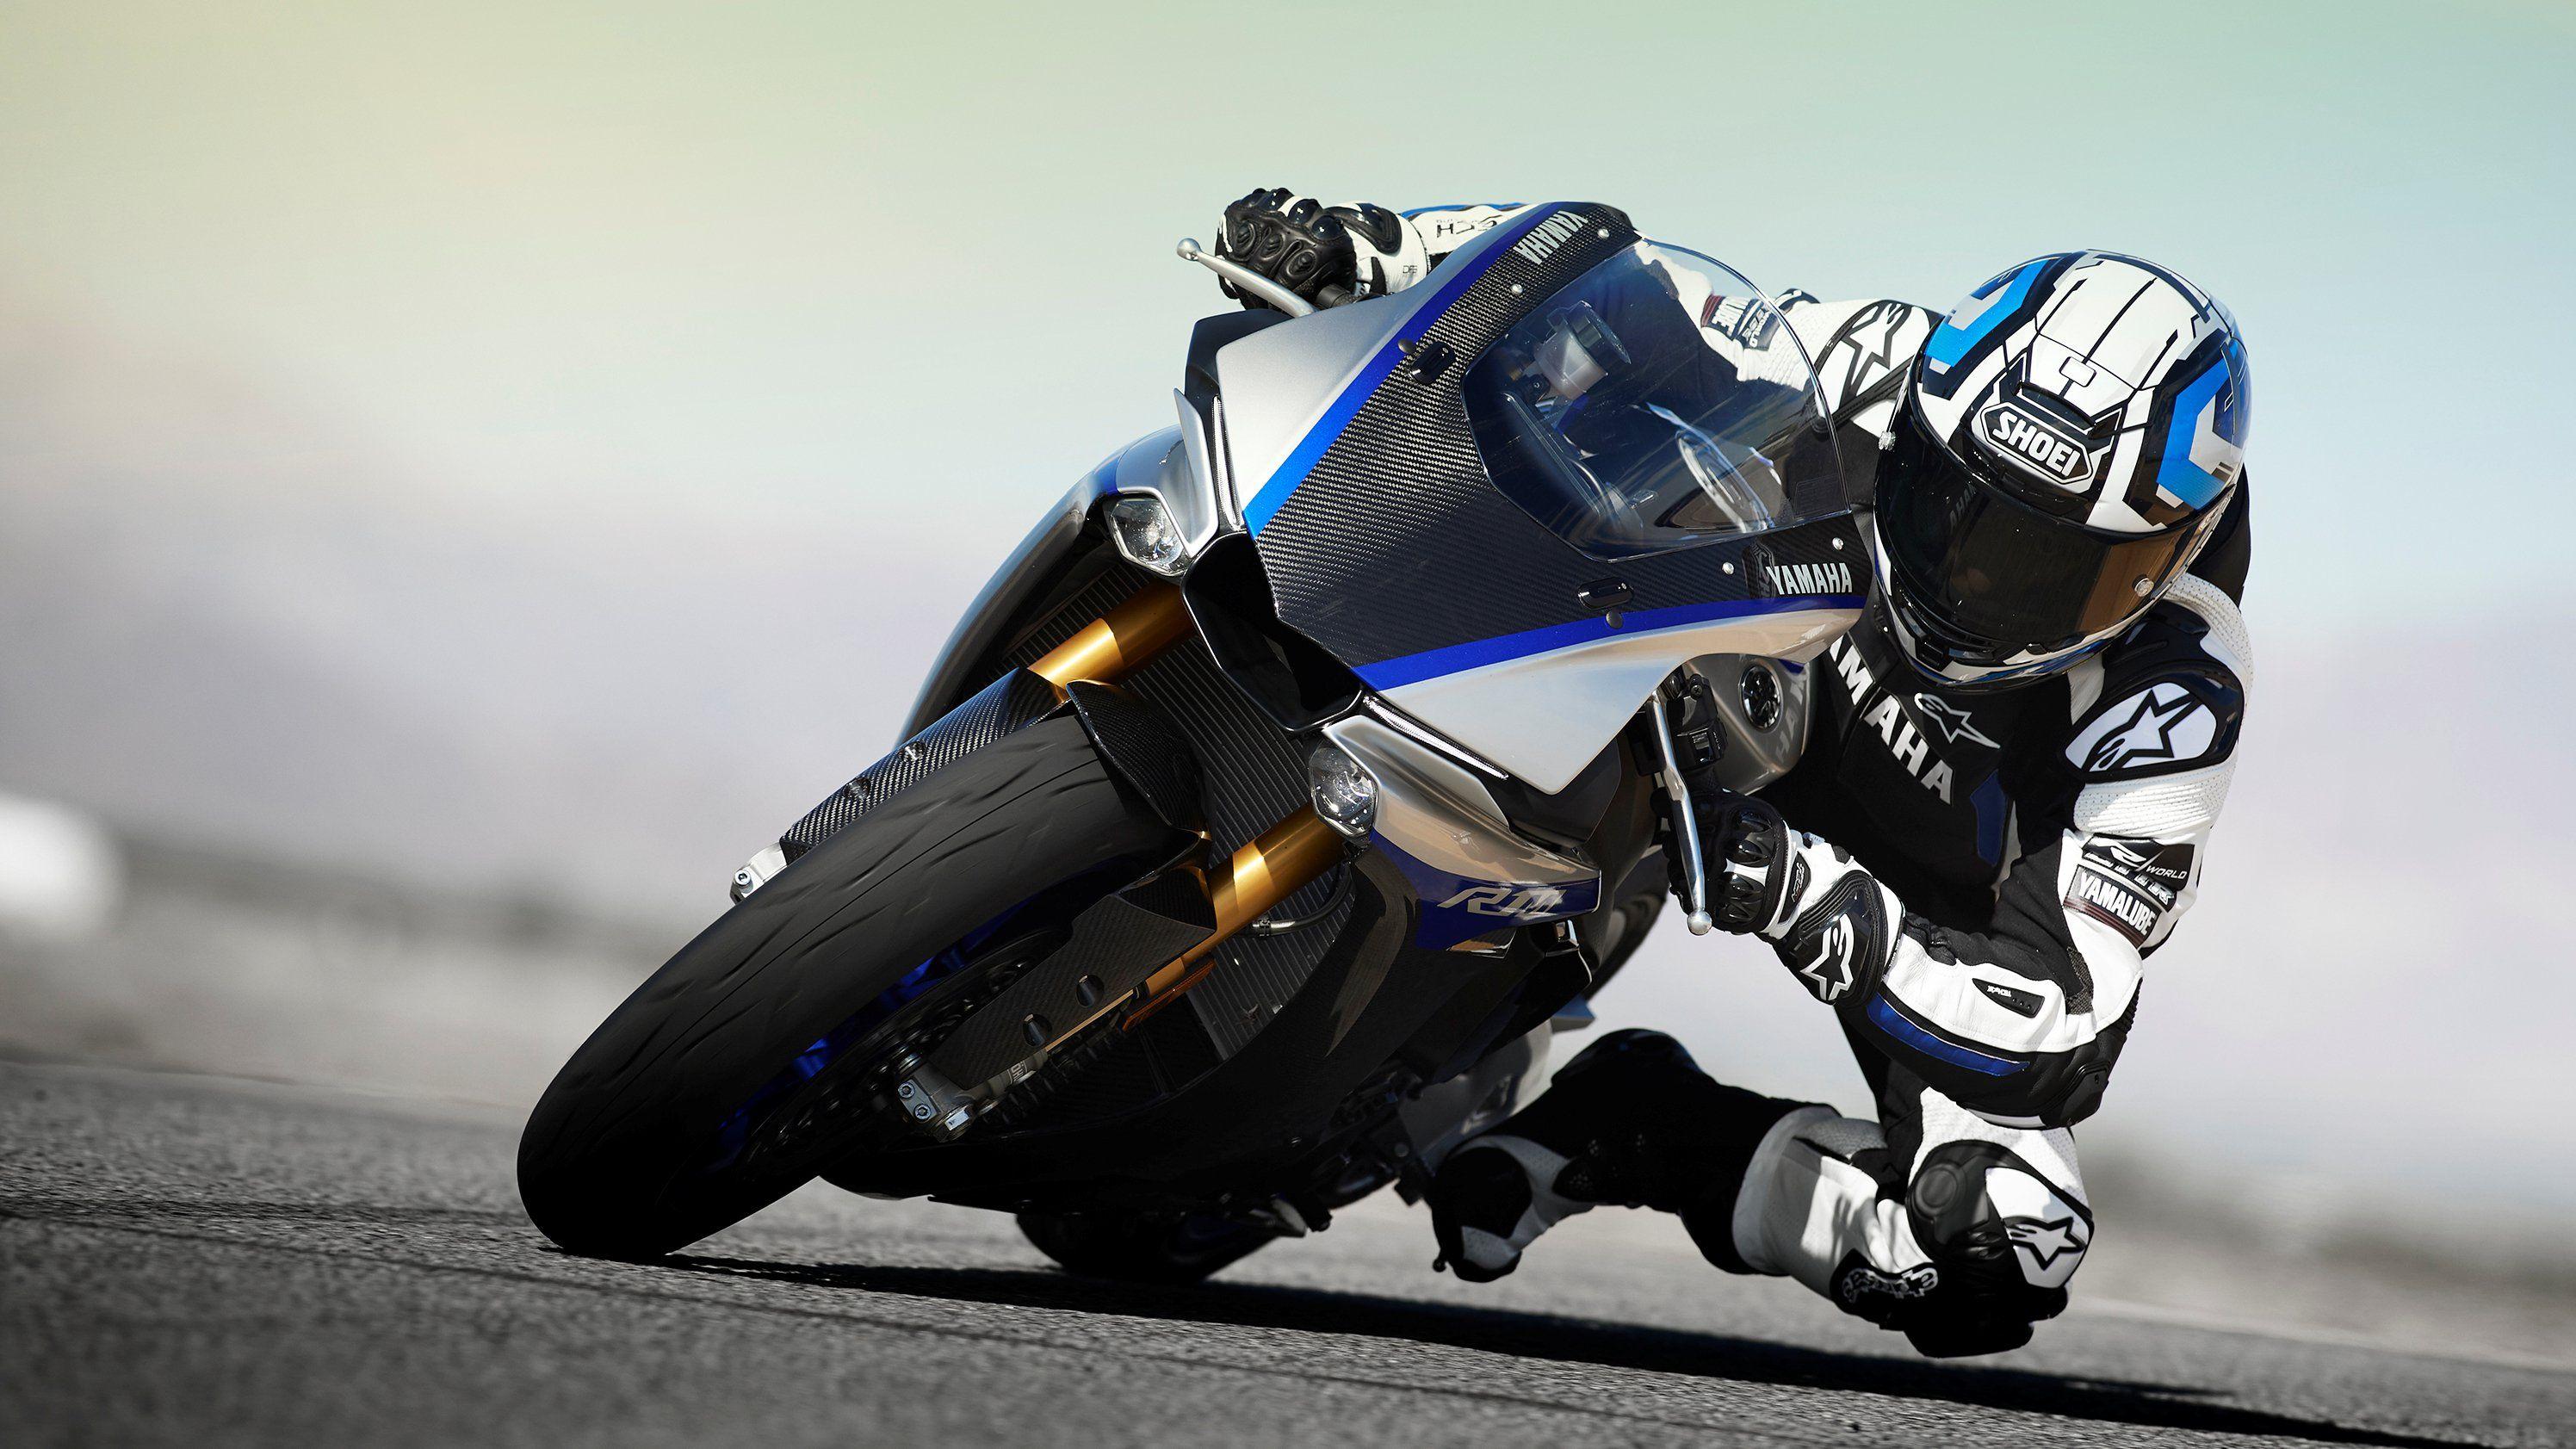 2018 Yamaha Yzf R1 R1m Motorcycles Yamaha Yzf R1 Yamaha Yzf